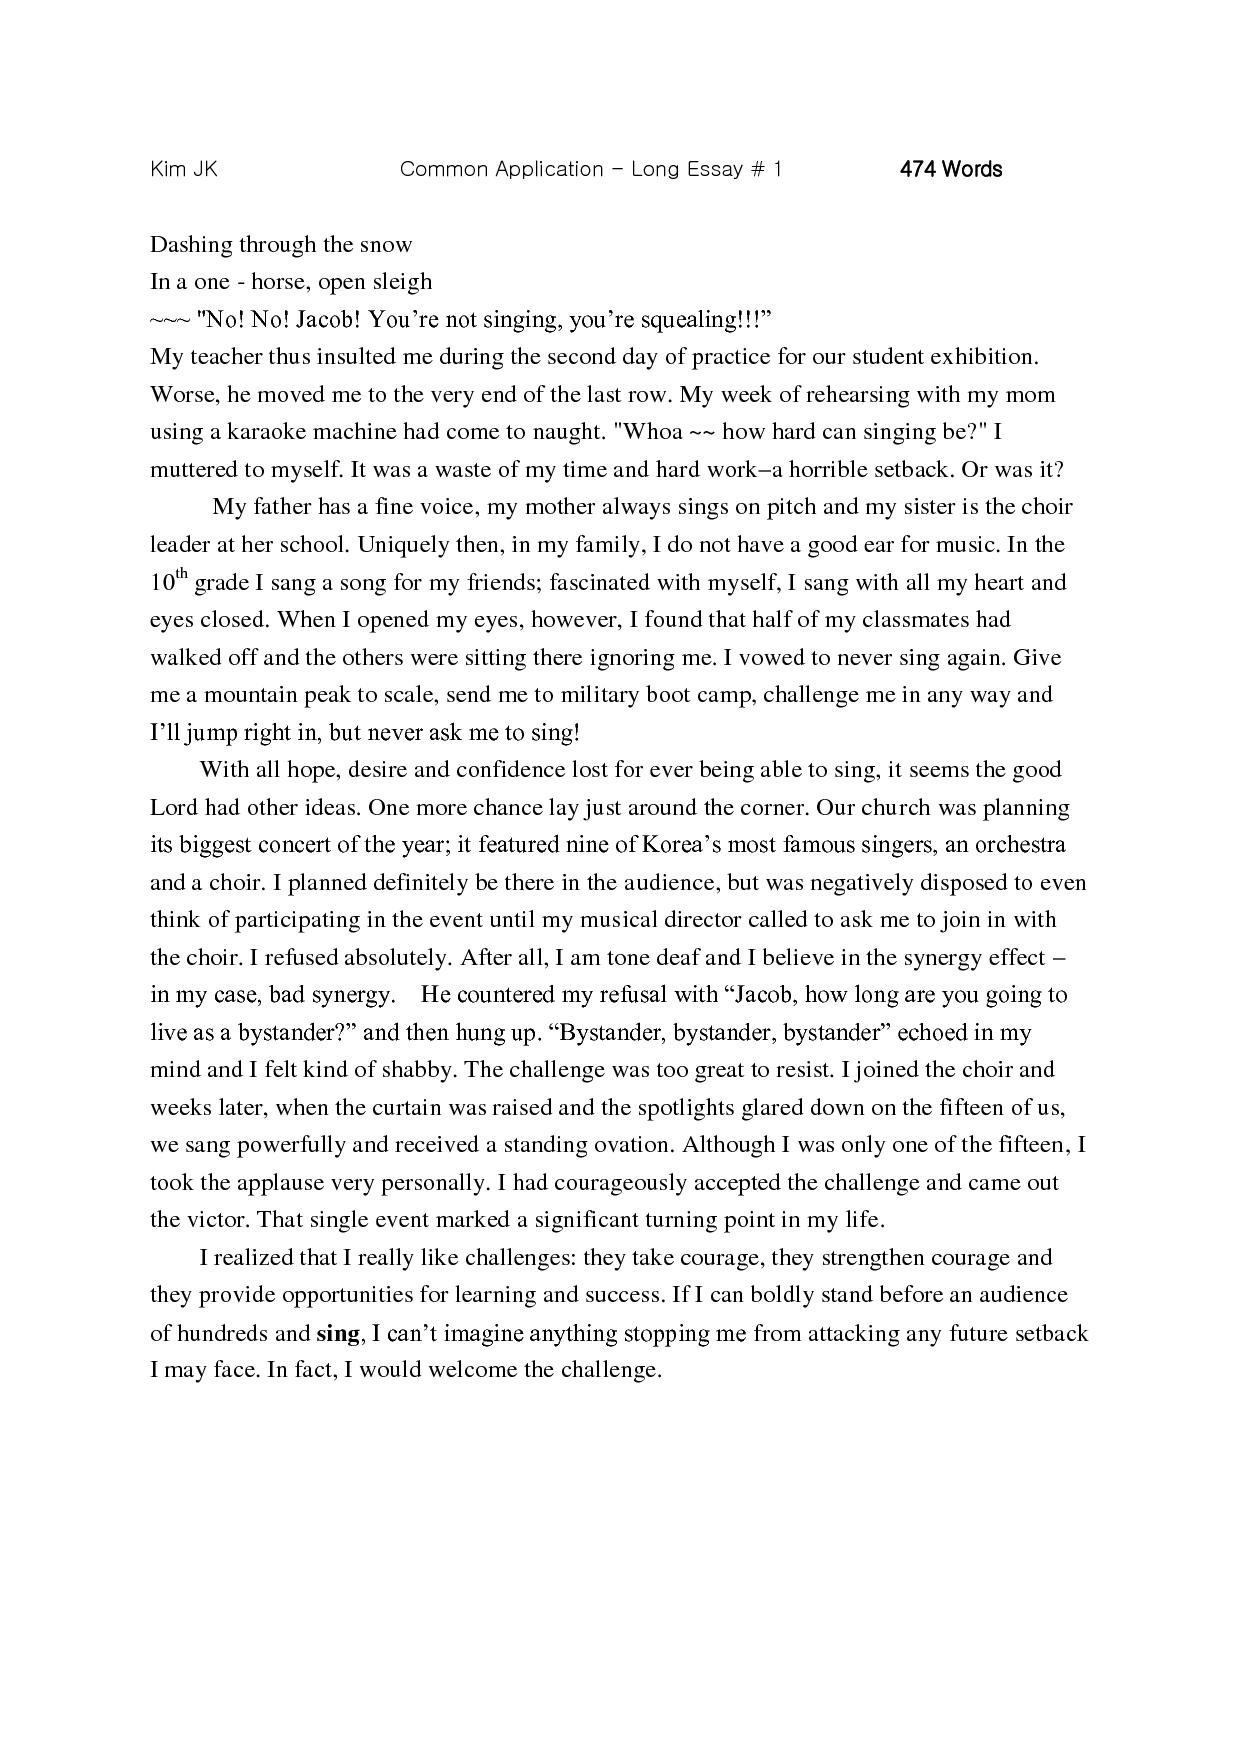 001 College Essay Word Limit Good Common App Essays Resume Writing Application Help Cnessayjuvi Impressive Count Admission 2019 Full